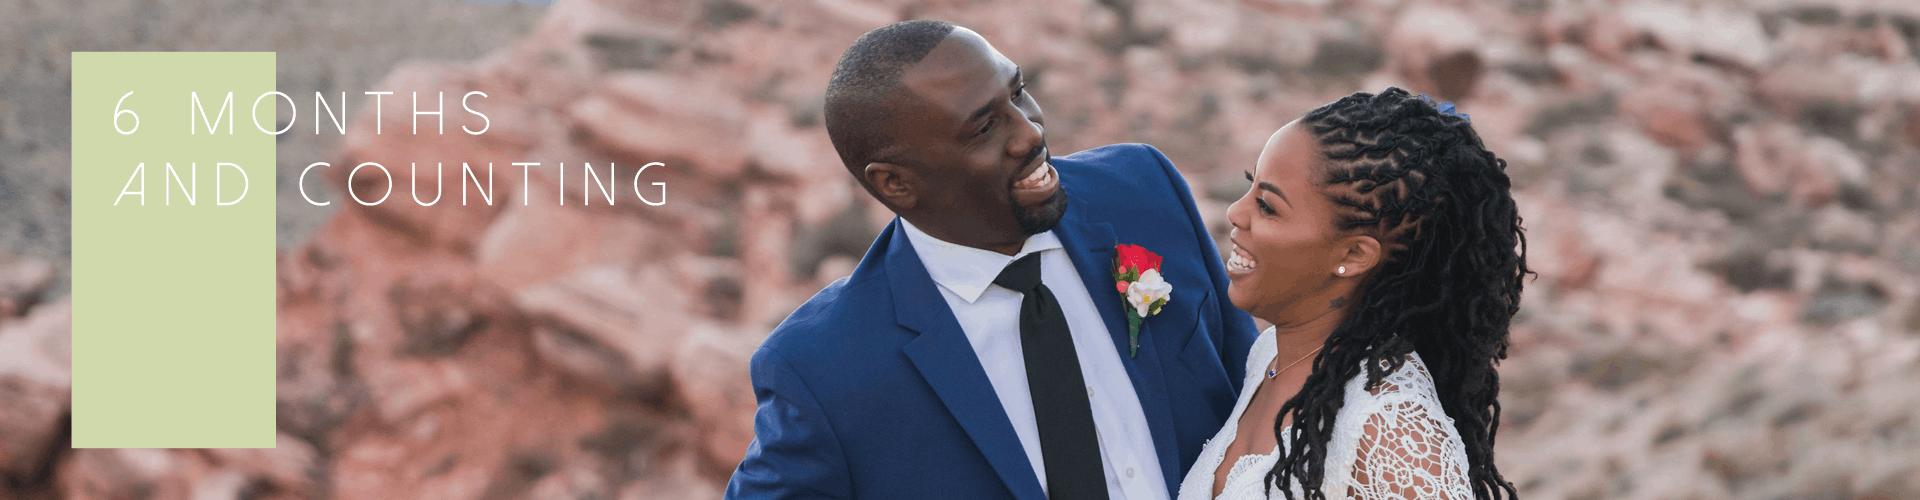 Destination Wedding Checklist Every Bride Needs